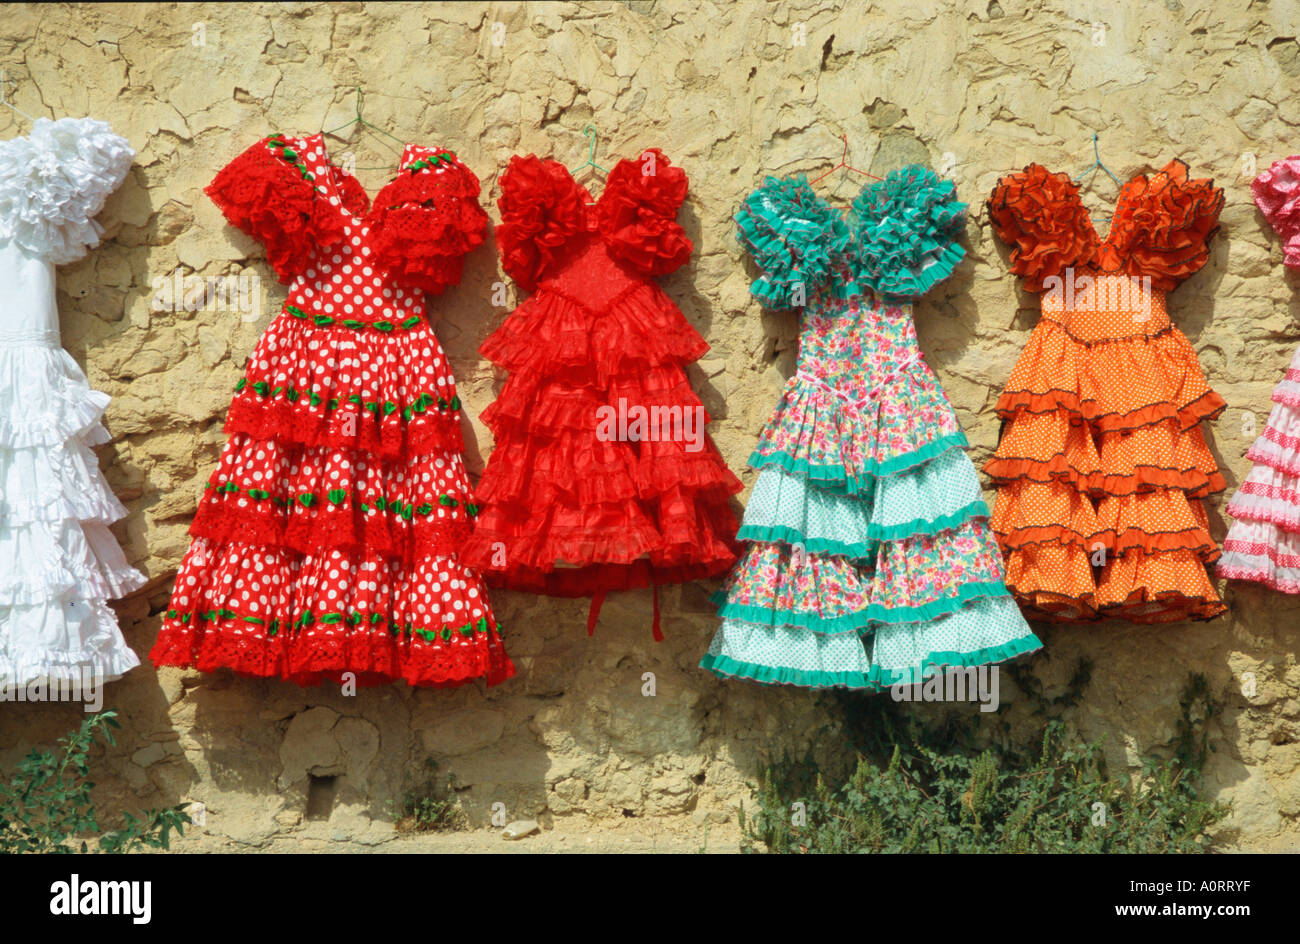 Flamenco clothes / La Nucia / Flamenco-Kleider - Stock Image